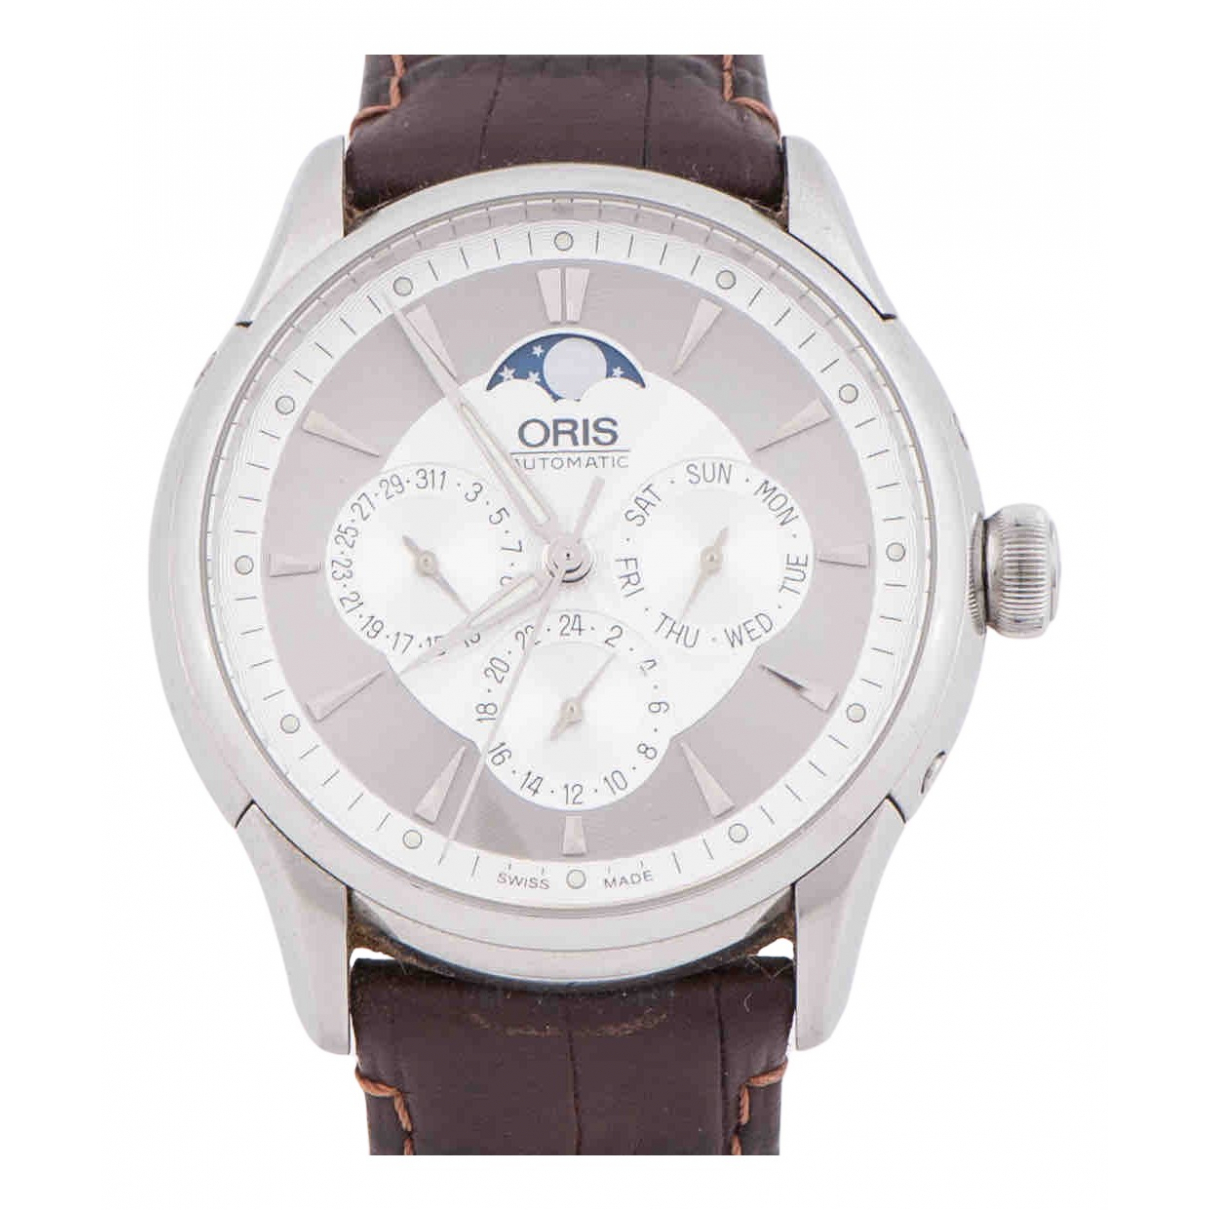 Relojes Artelier Complication Oris